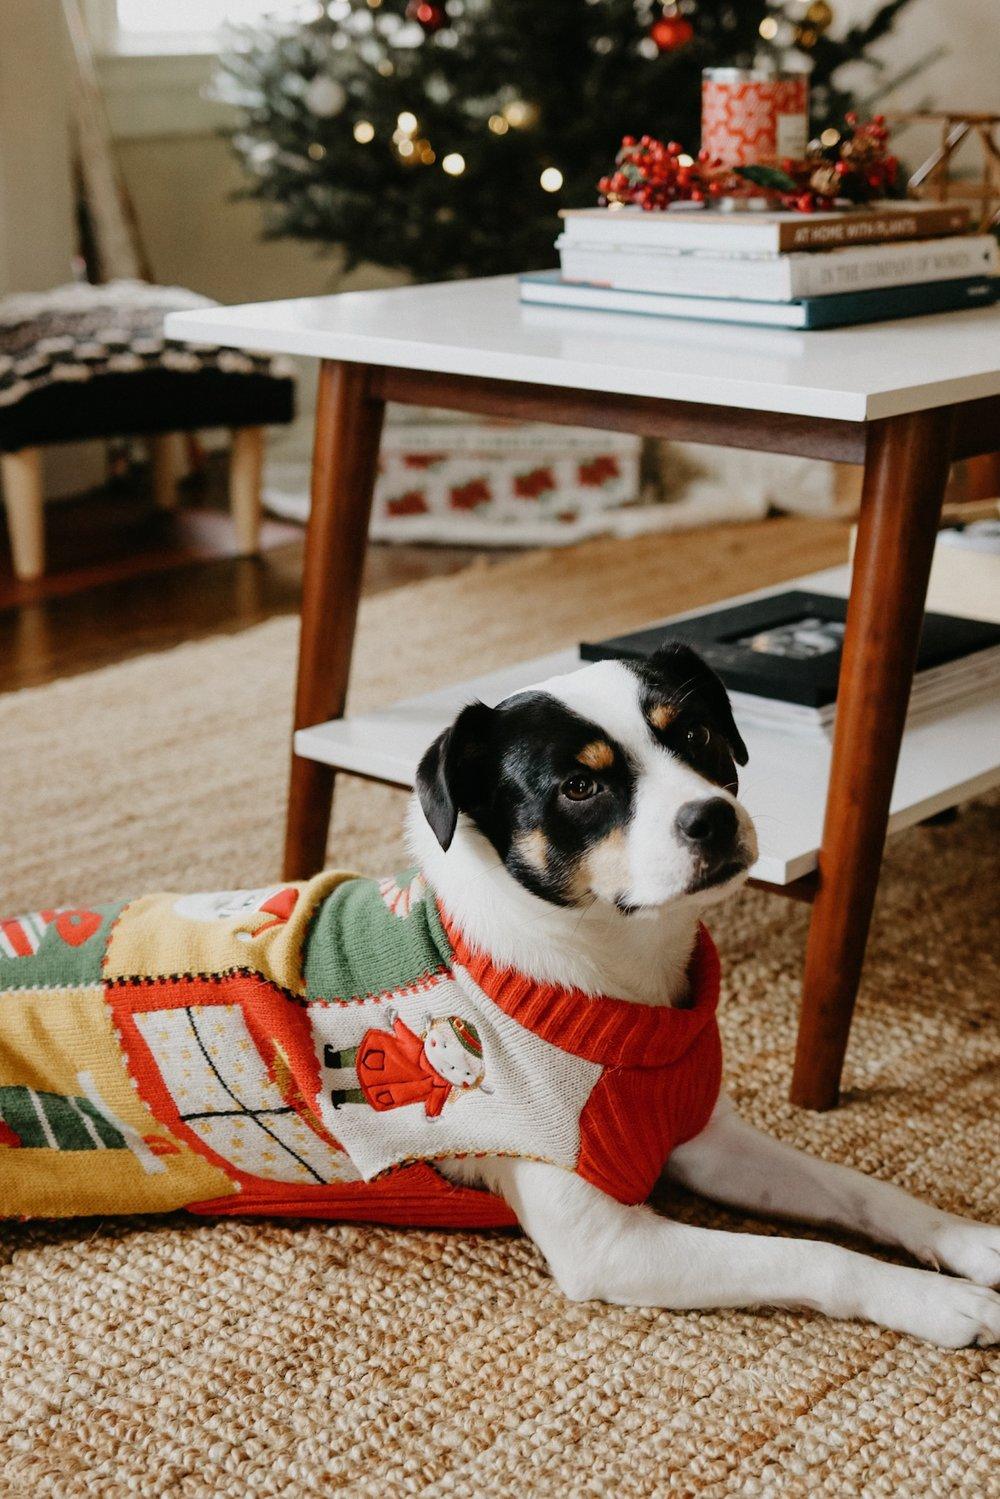 Holiday Home Decor - Sarah Heyl